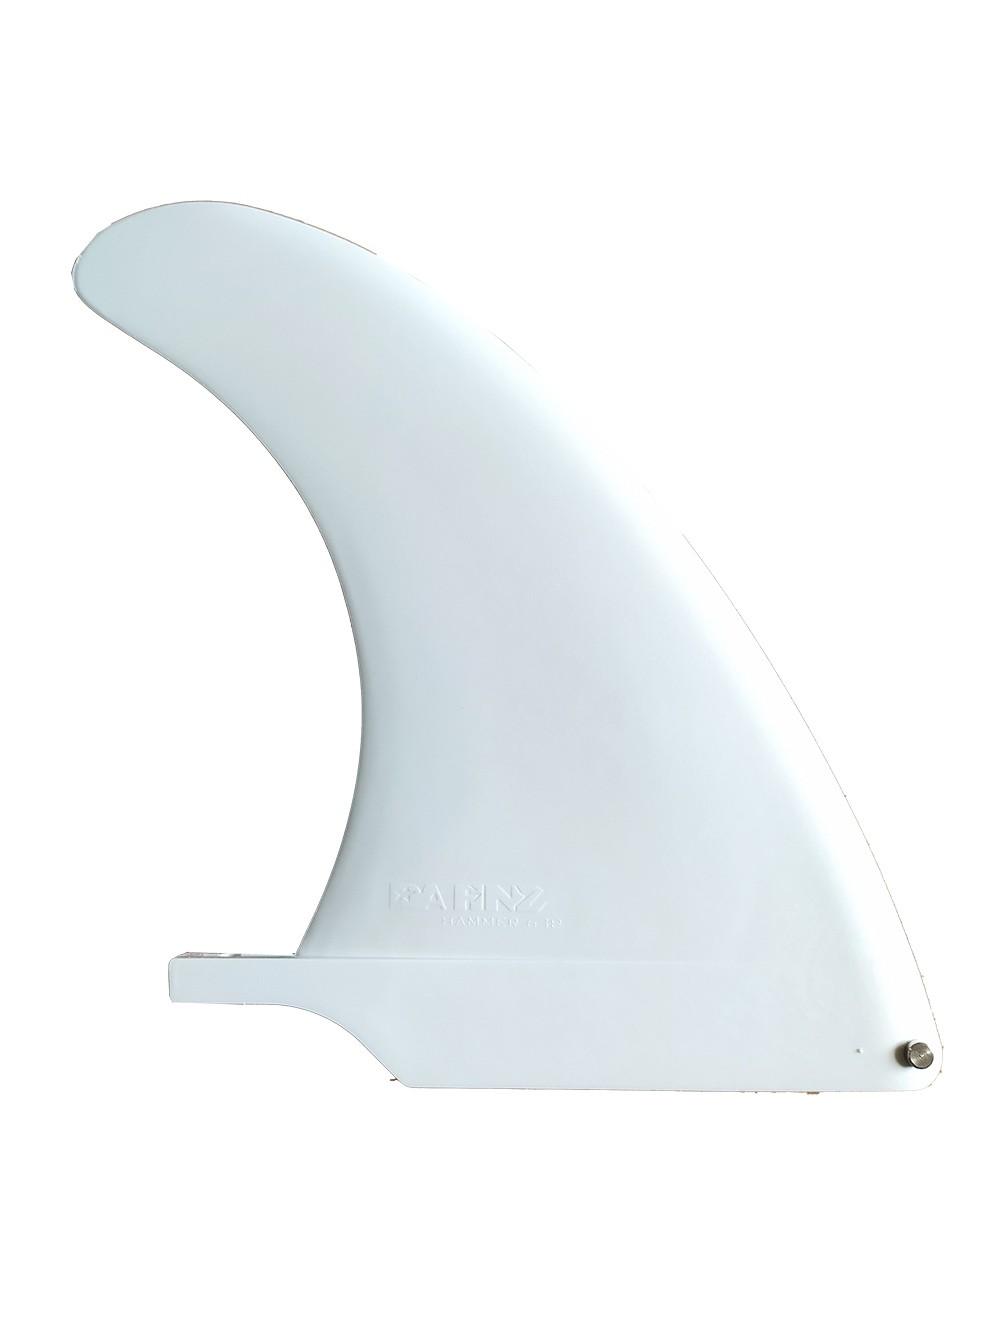 "Quilha Central para pranchas Surf Longboard 6'83"" Branca"